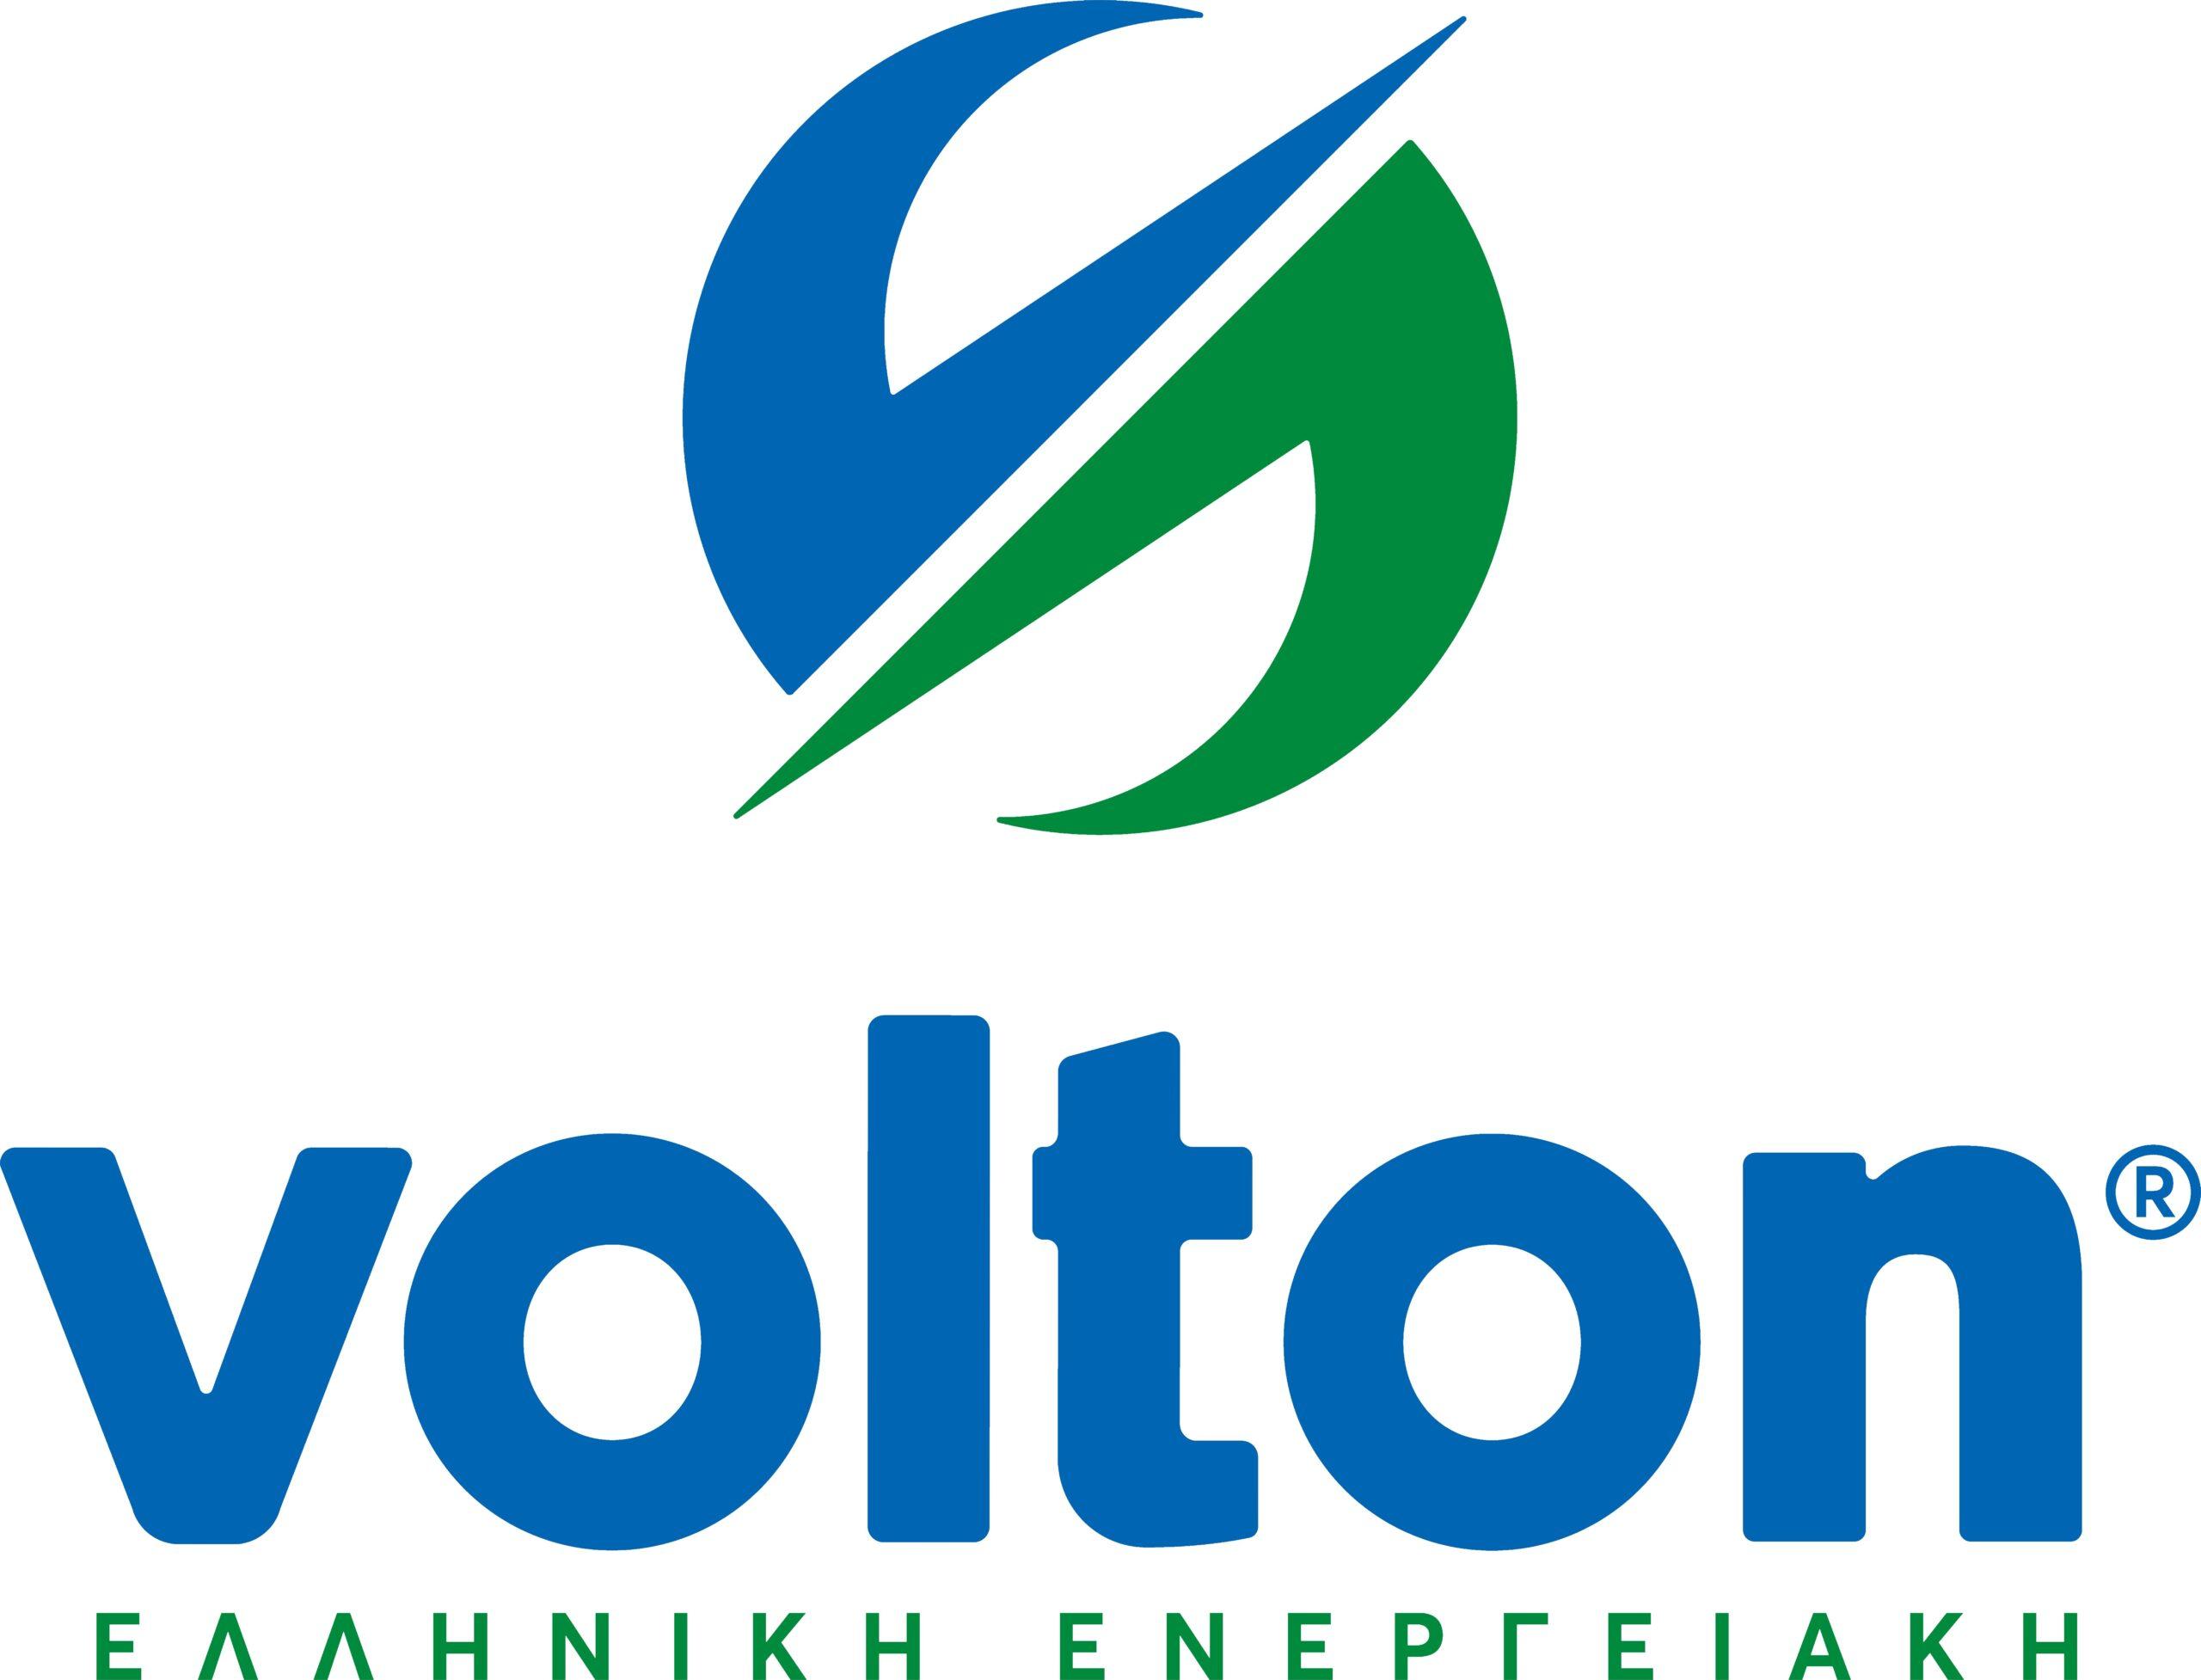 Volton και Αστέρας Τρίπολης συνεχίζουν να αγωνίζονται μαζί και αυτή τη χρονιά